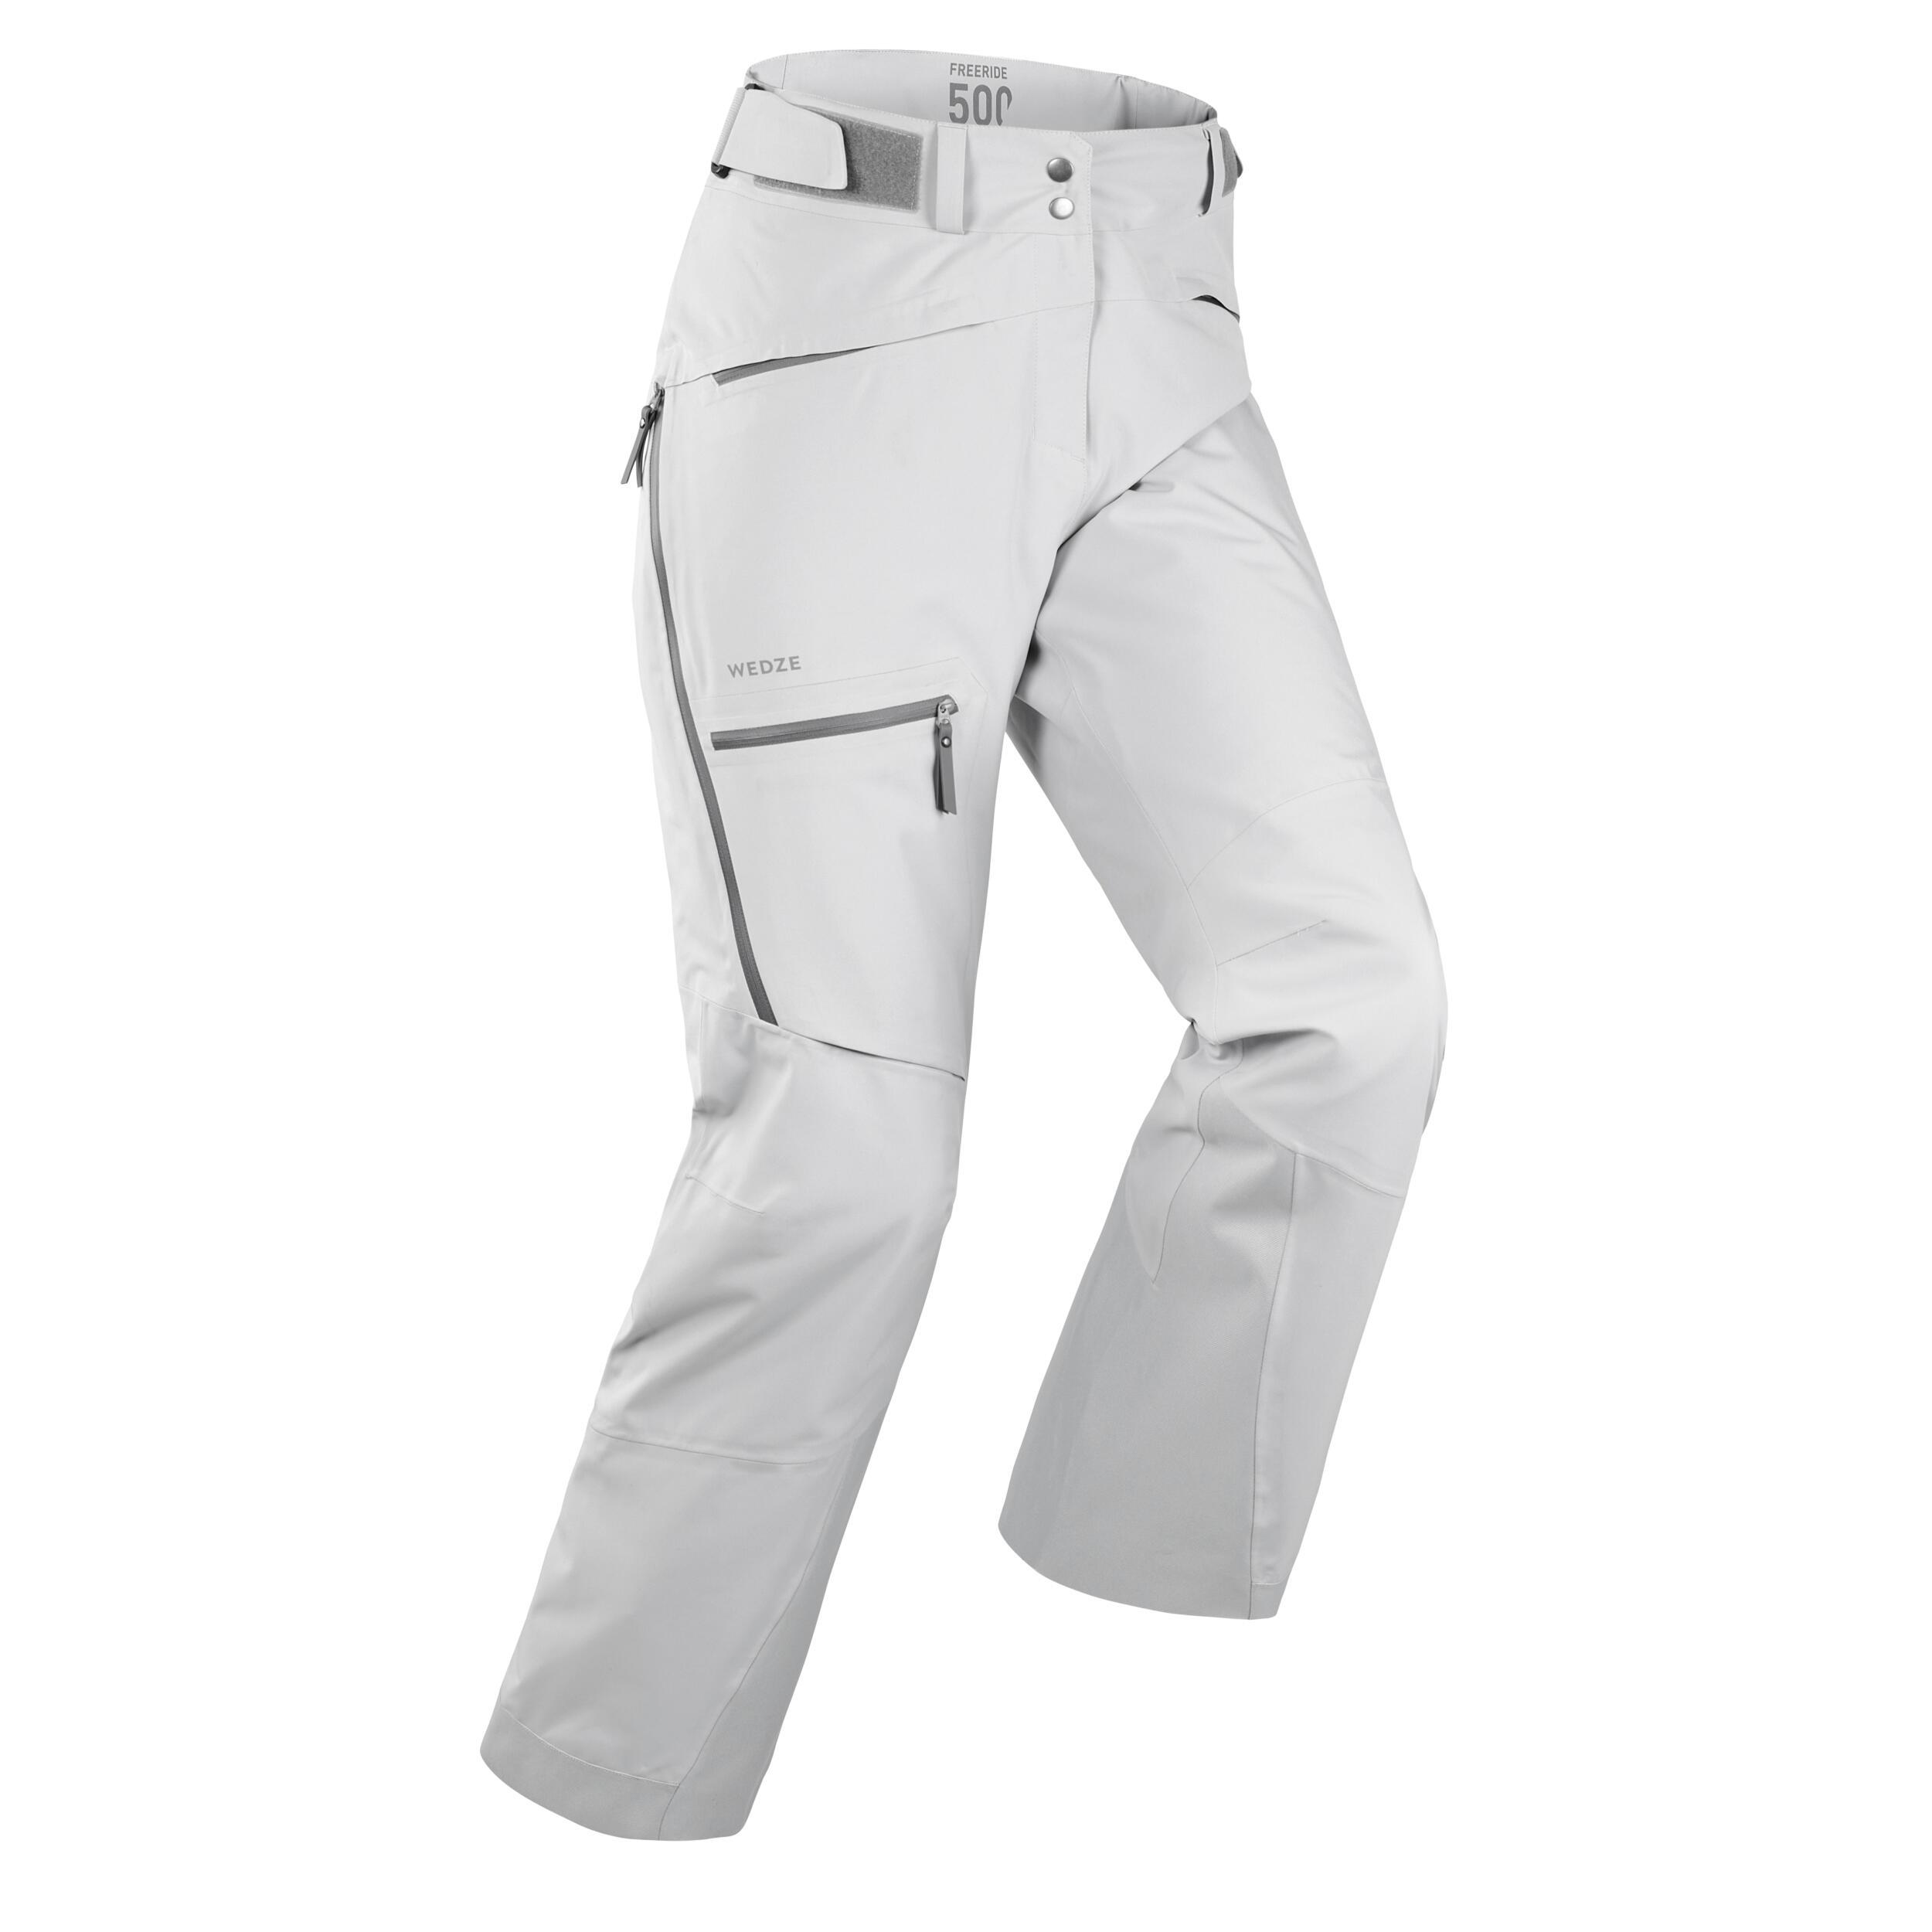 Pantalon de ski freeride femme fr500 gris wedze